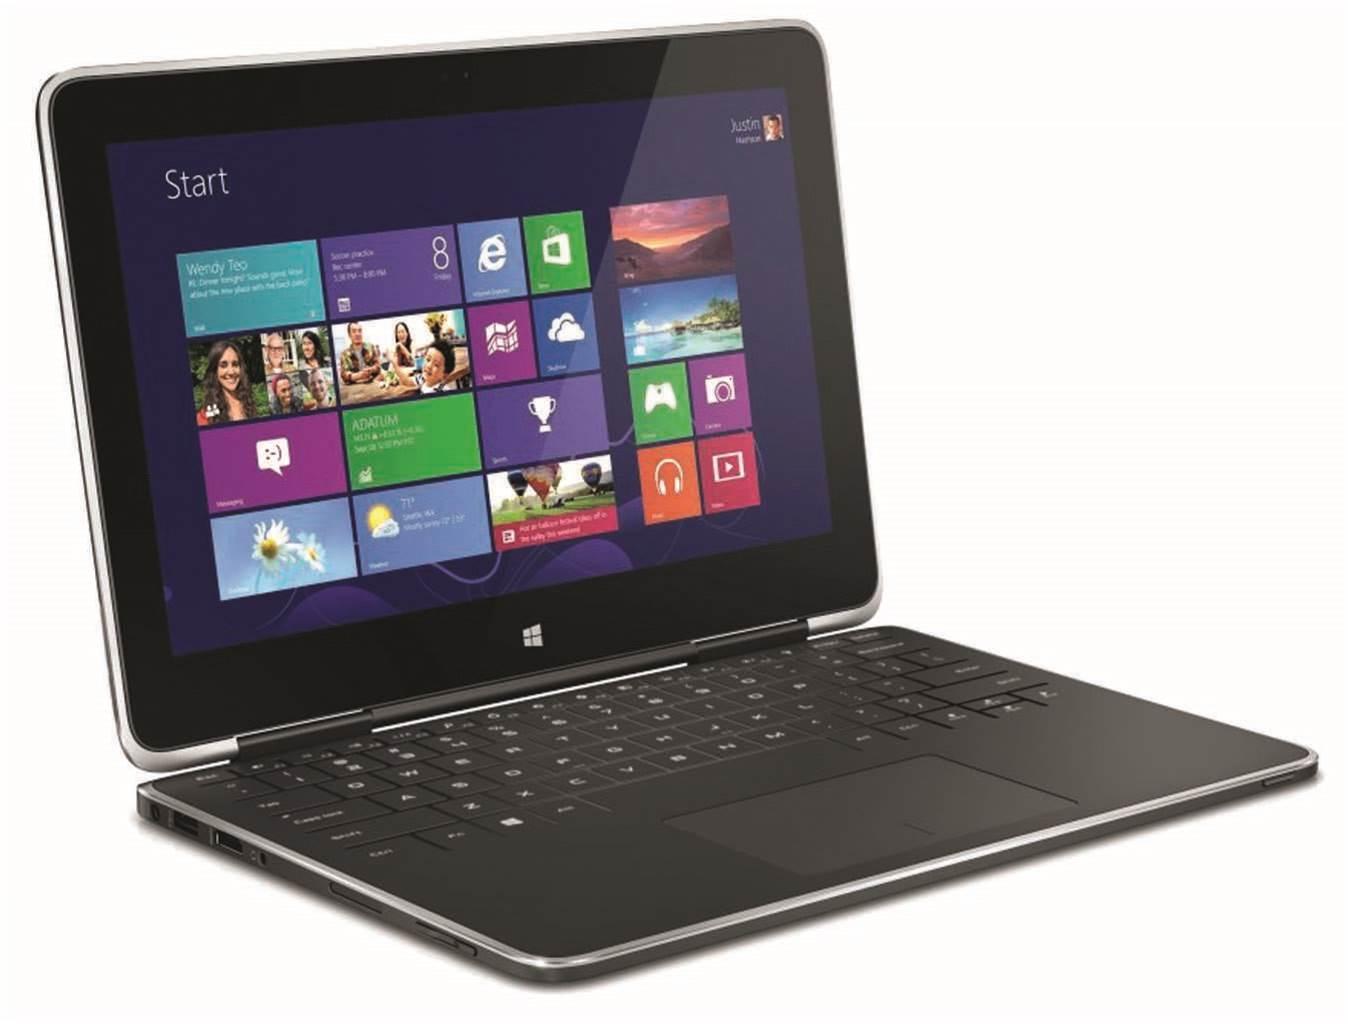 Labs Brief: Dell XPS 11